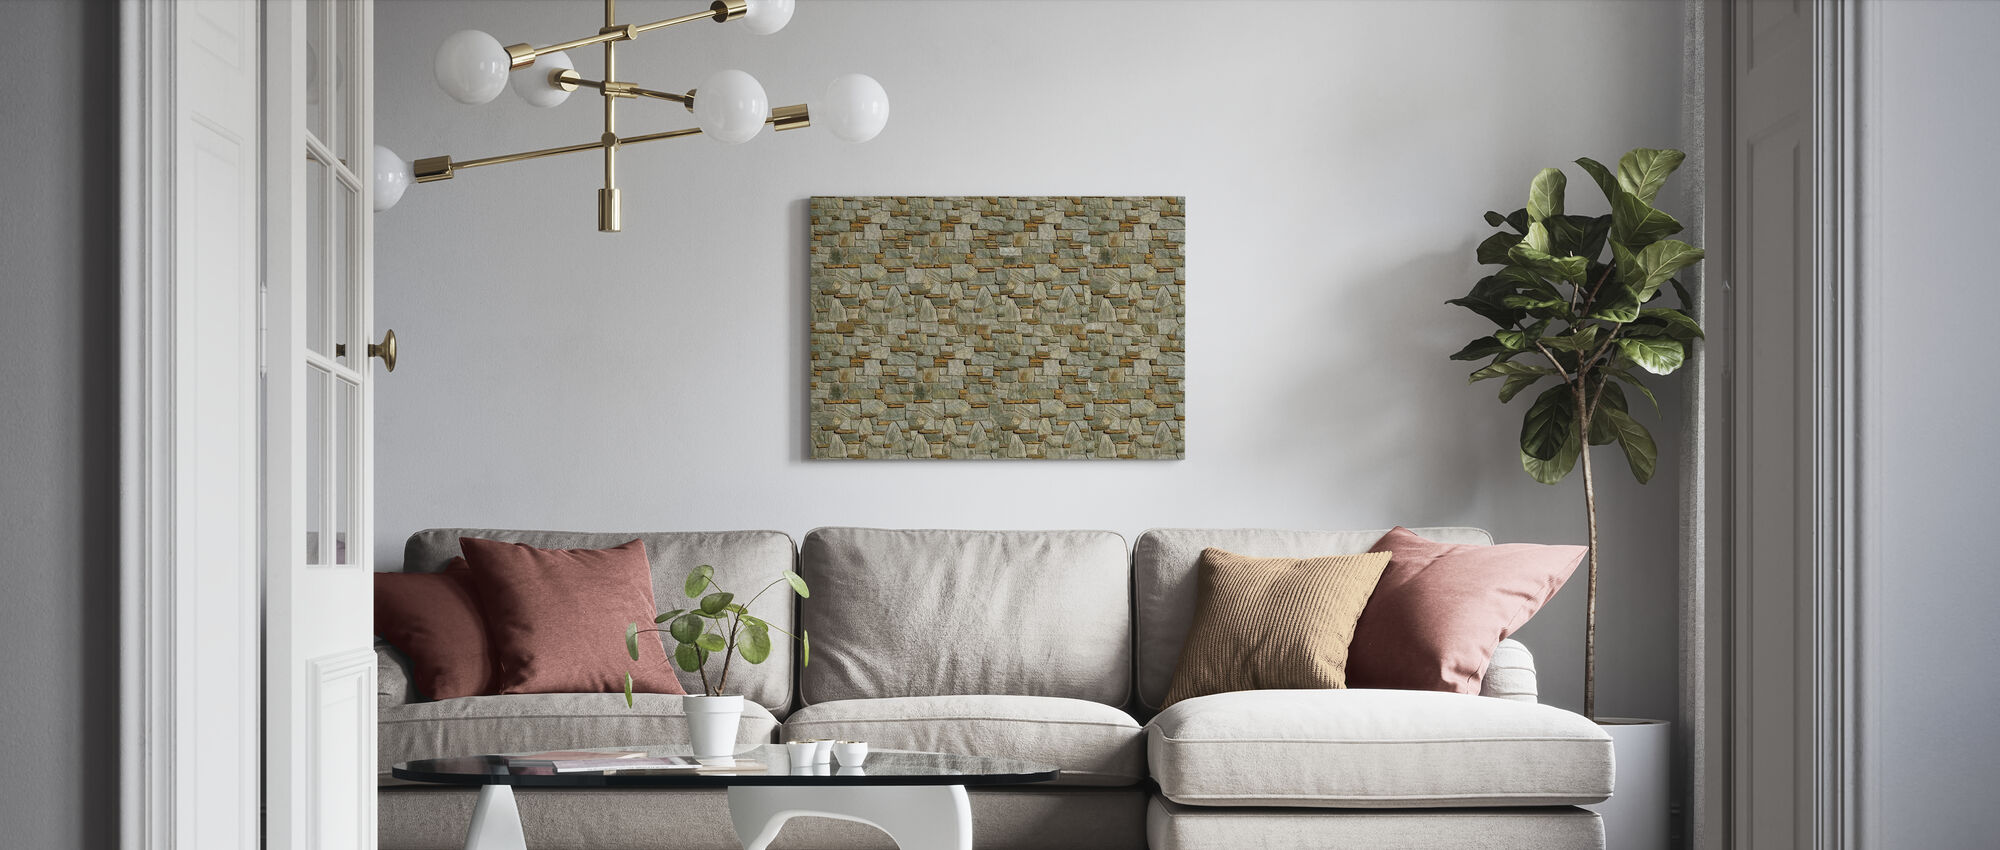 Decorative Stone Wall - Canvas print - Living Room